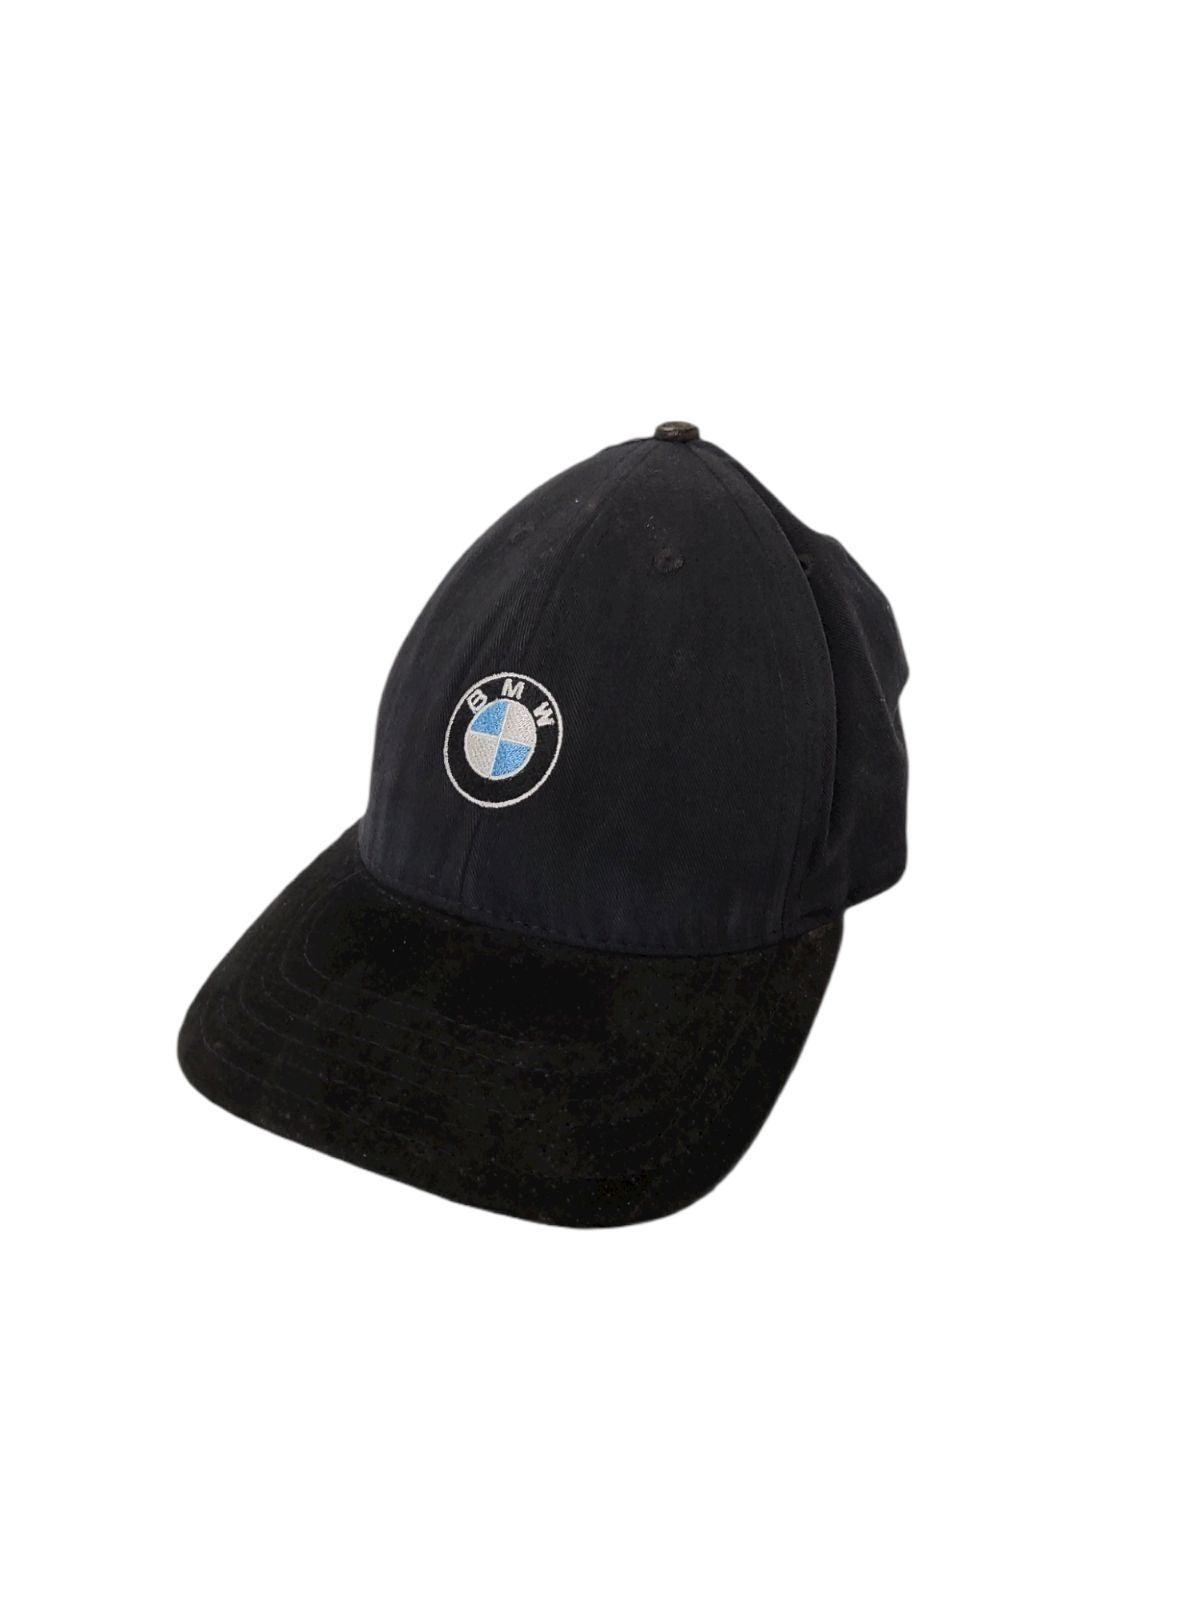 BMW Lifestyles Adjustable Black Suede Bi